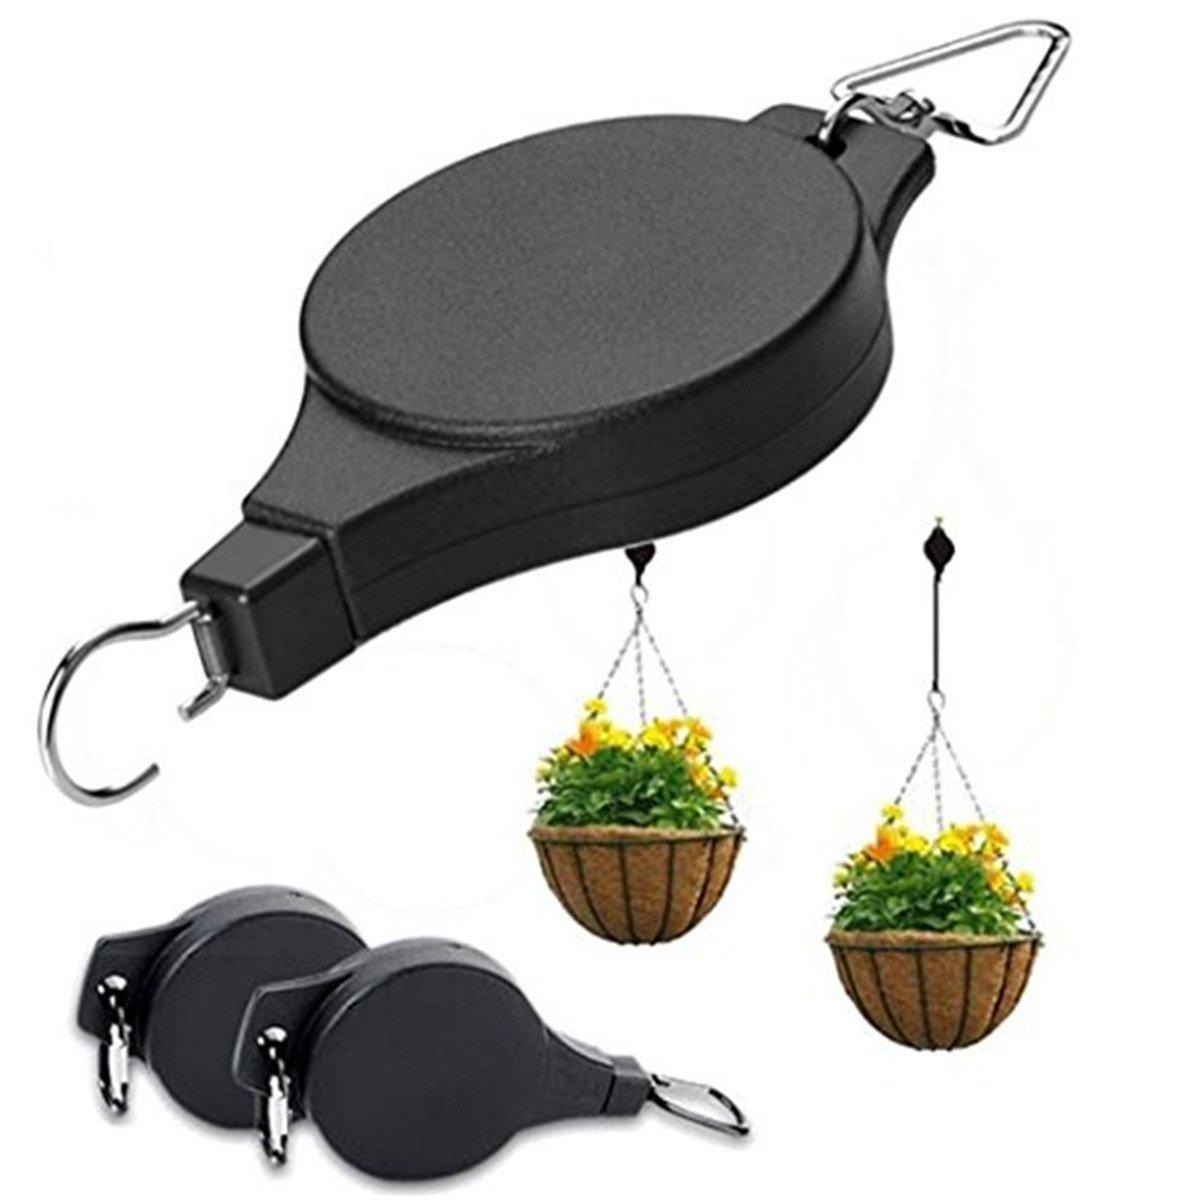 FTXJ Retractable Hanging Basket Pulley Flower Plant Pot Pull Down Hanger Garden Tool (Black (8 x 21.5cm))